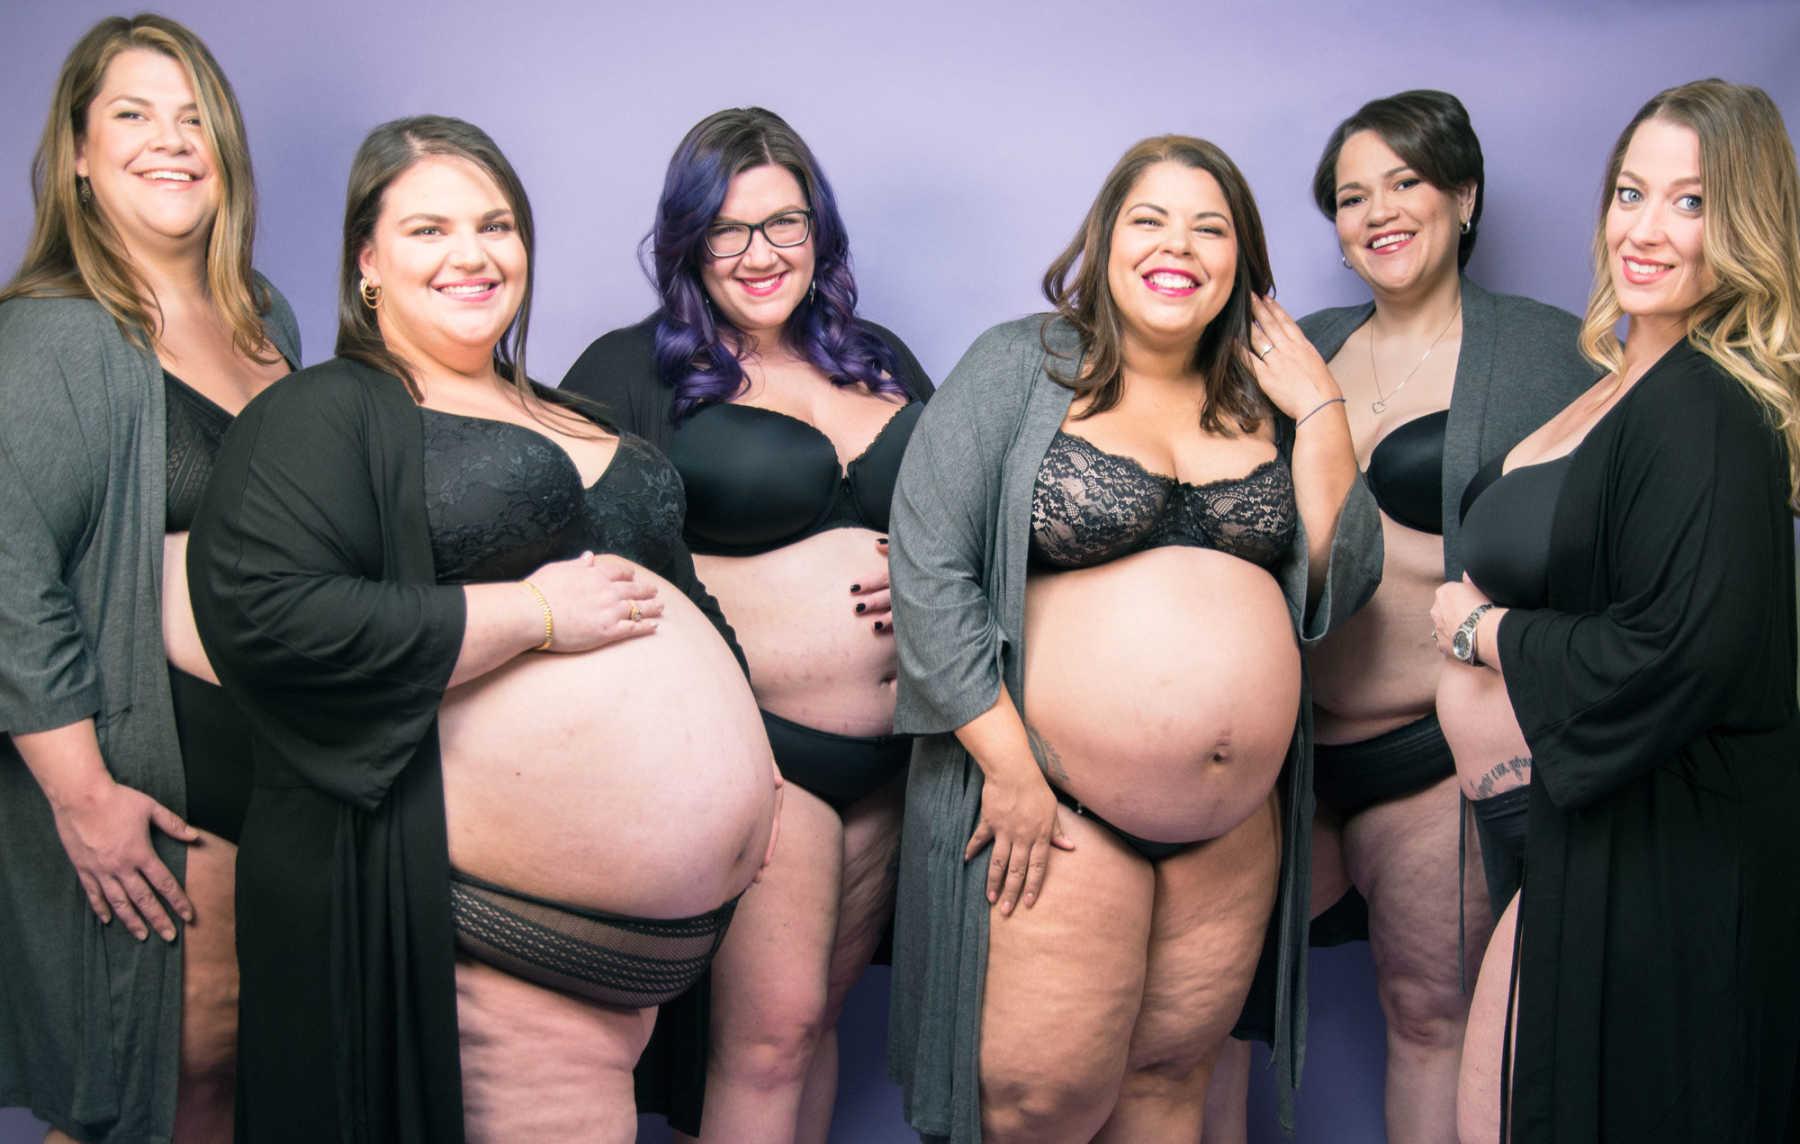 Huge Pregnant Belly Bbw